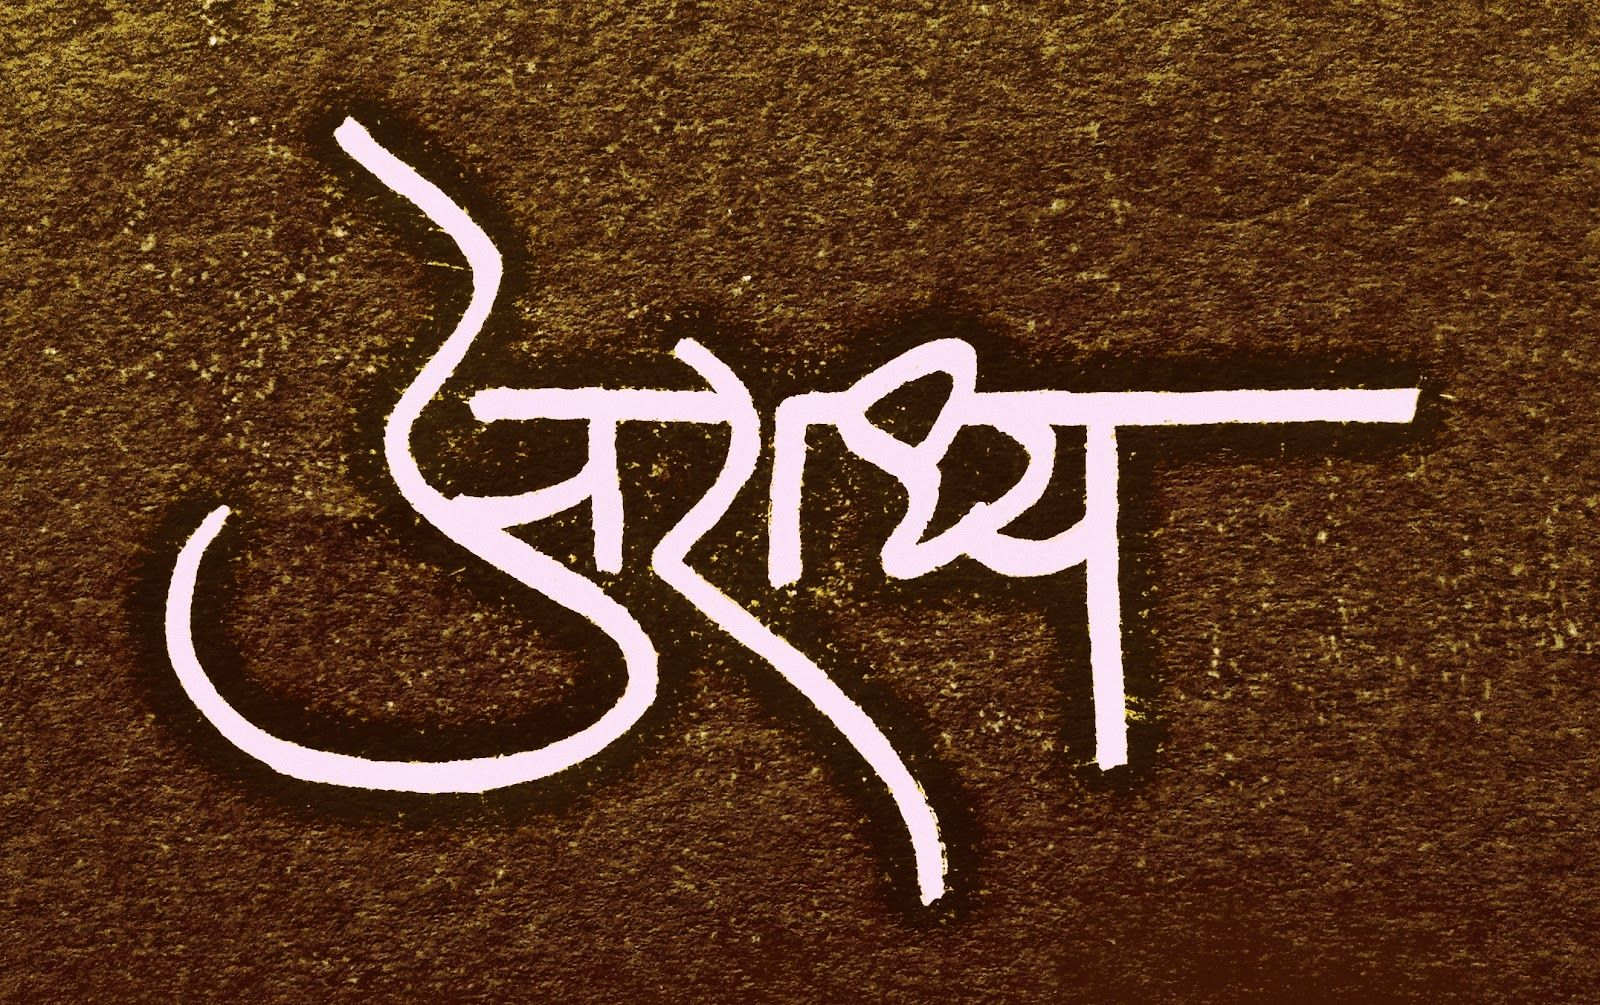 to my leisure अराध्य Hindi Calligraphy (With